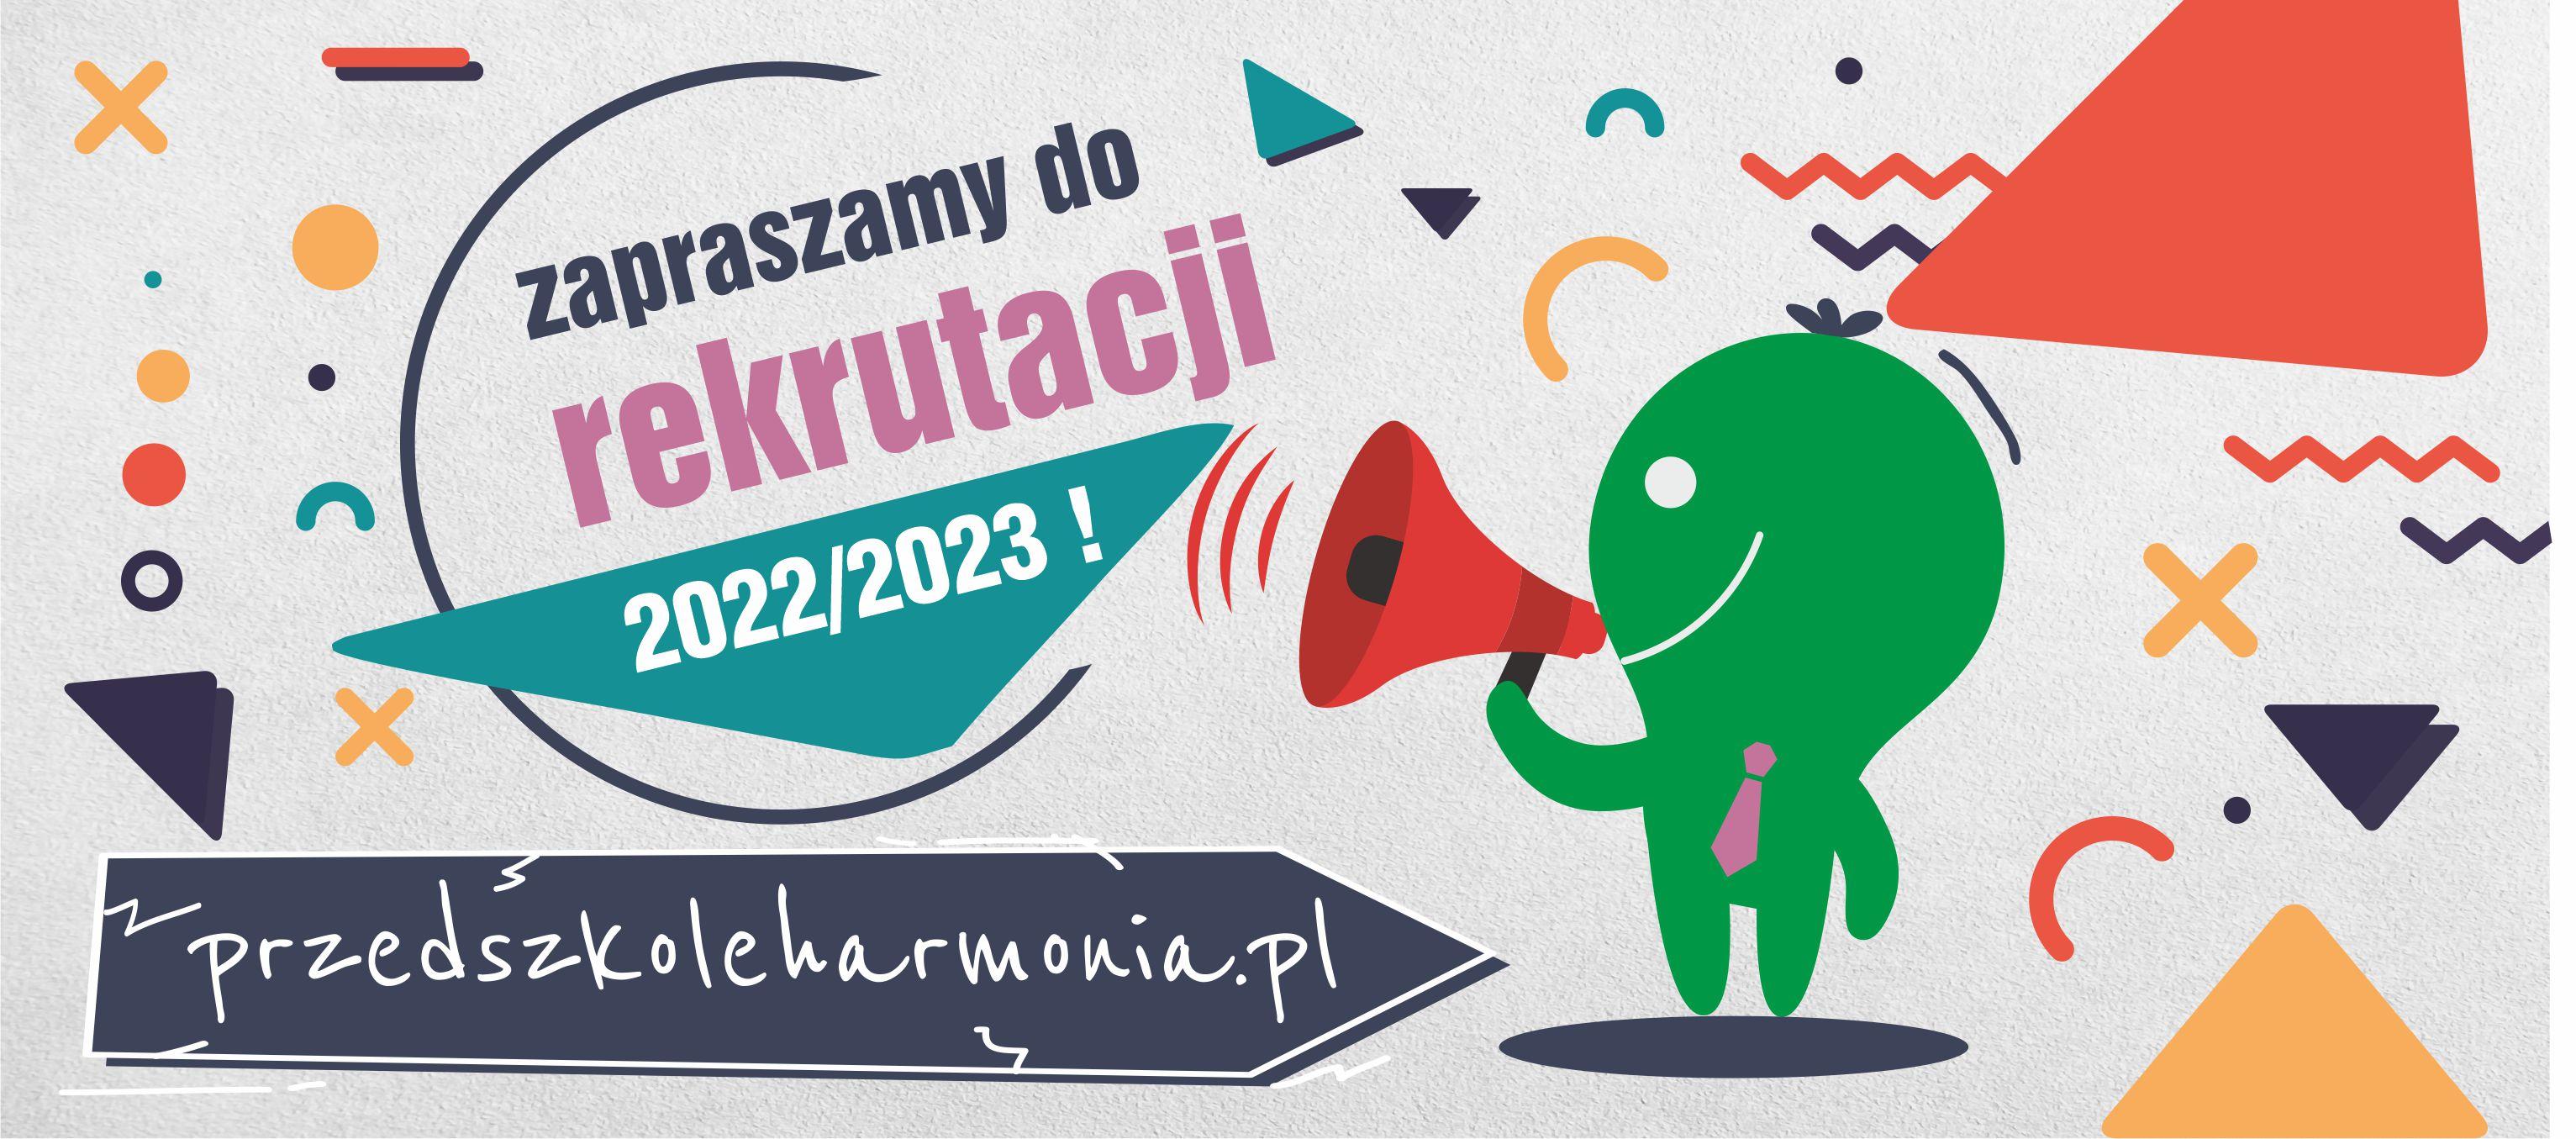 rekrutacja_2022_2023